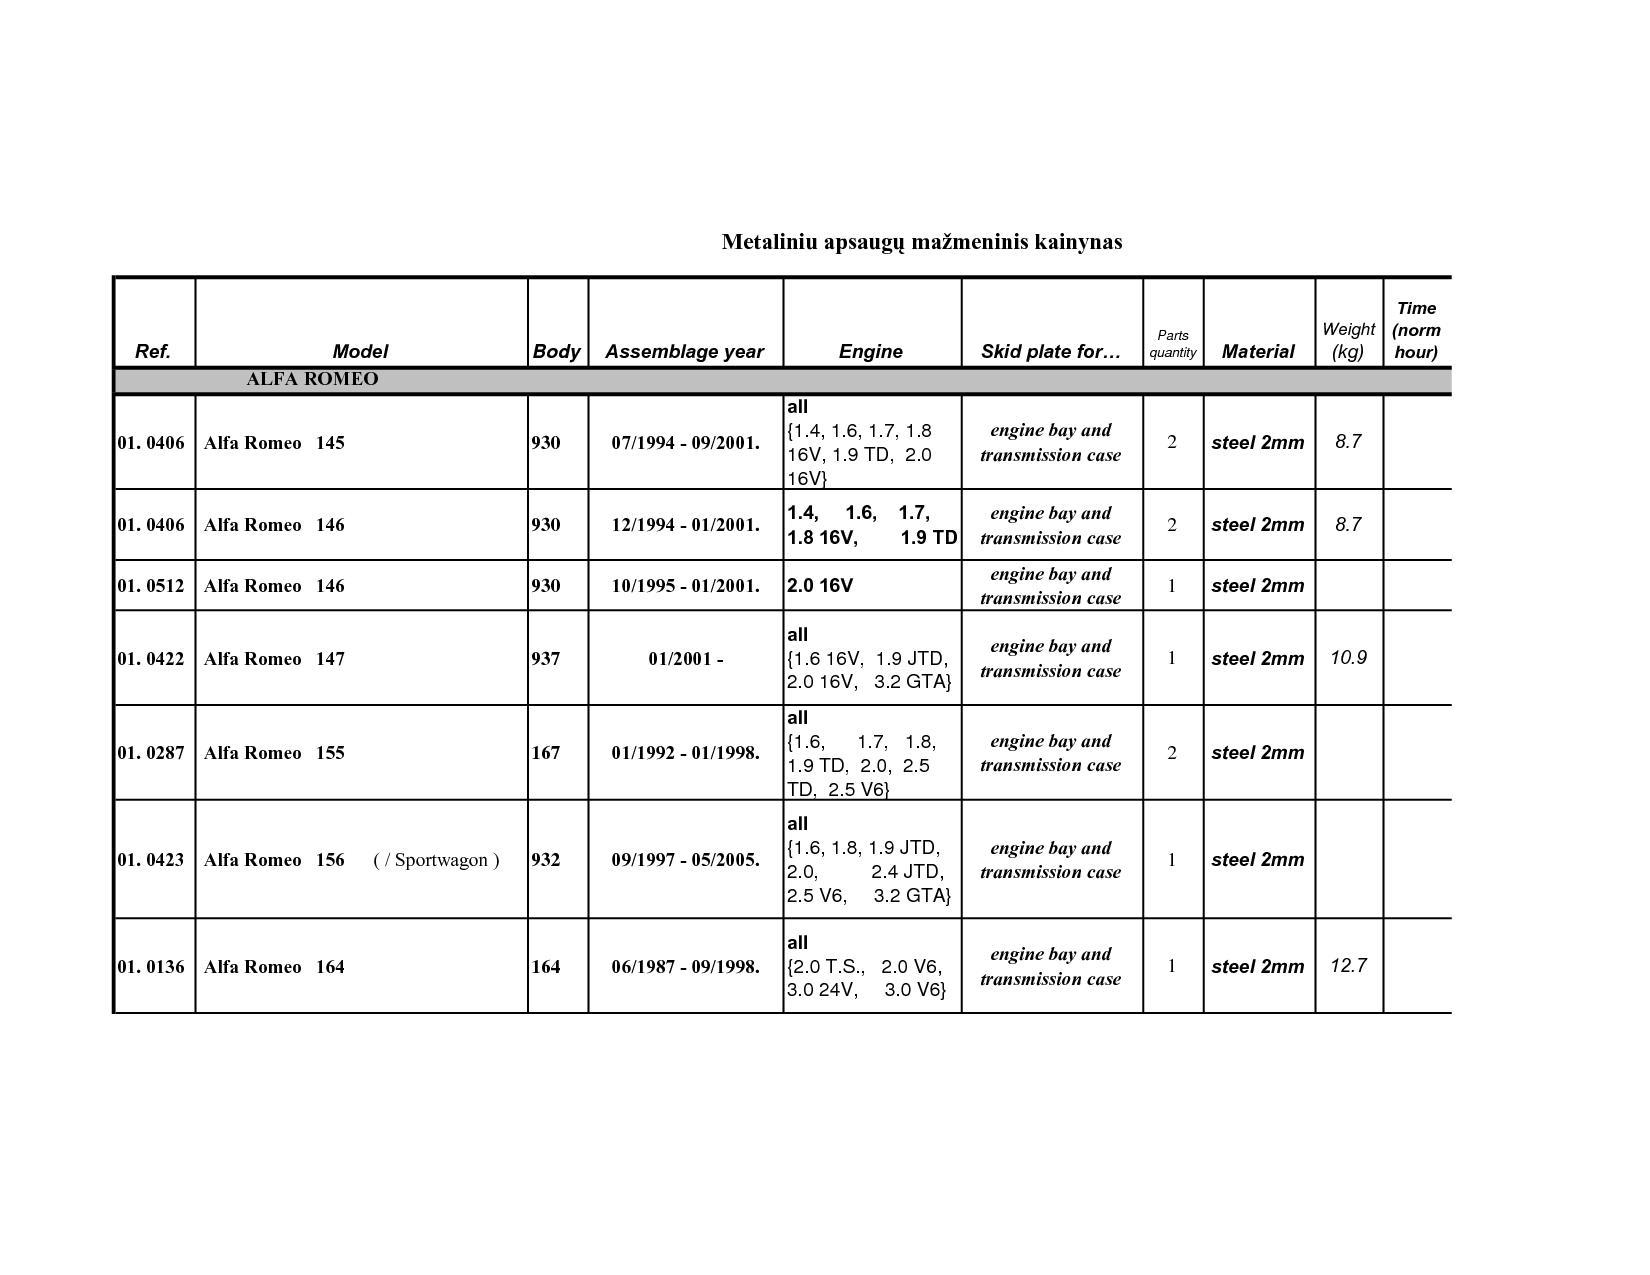 Doninvest Kondor 2.0 i 16V MT